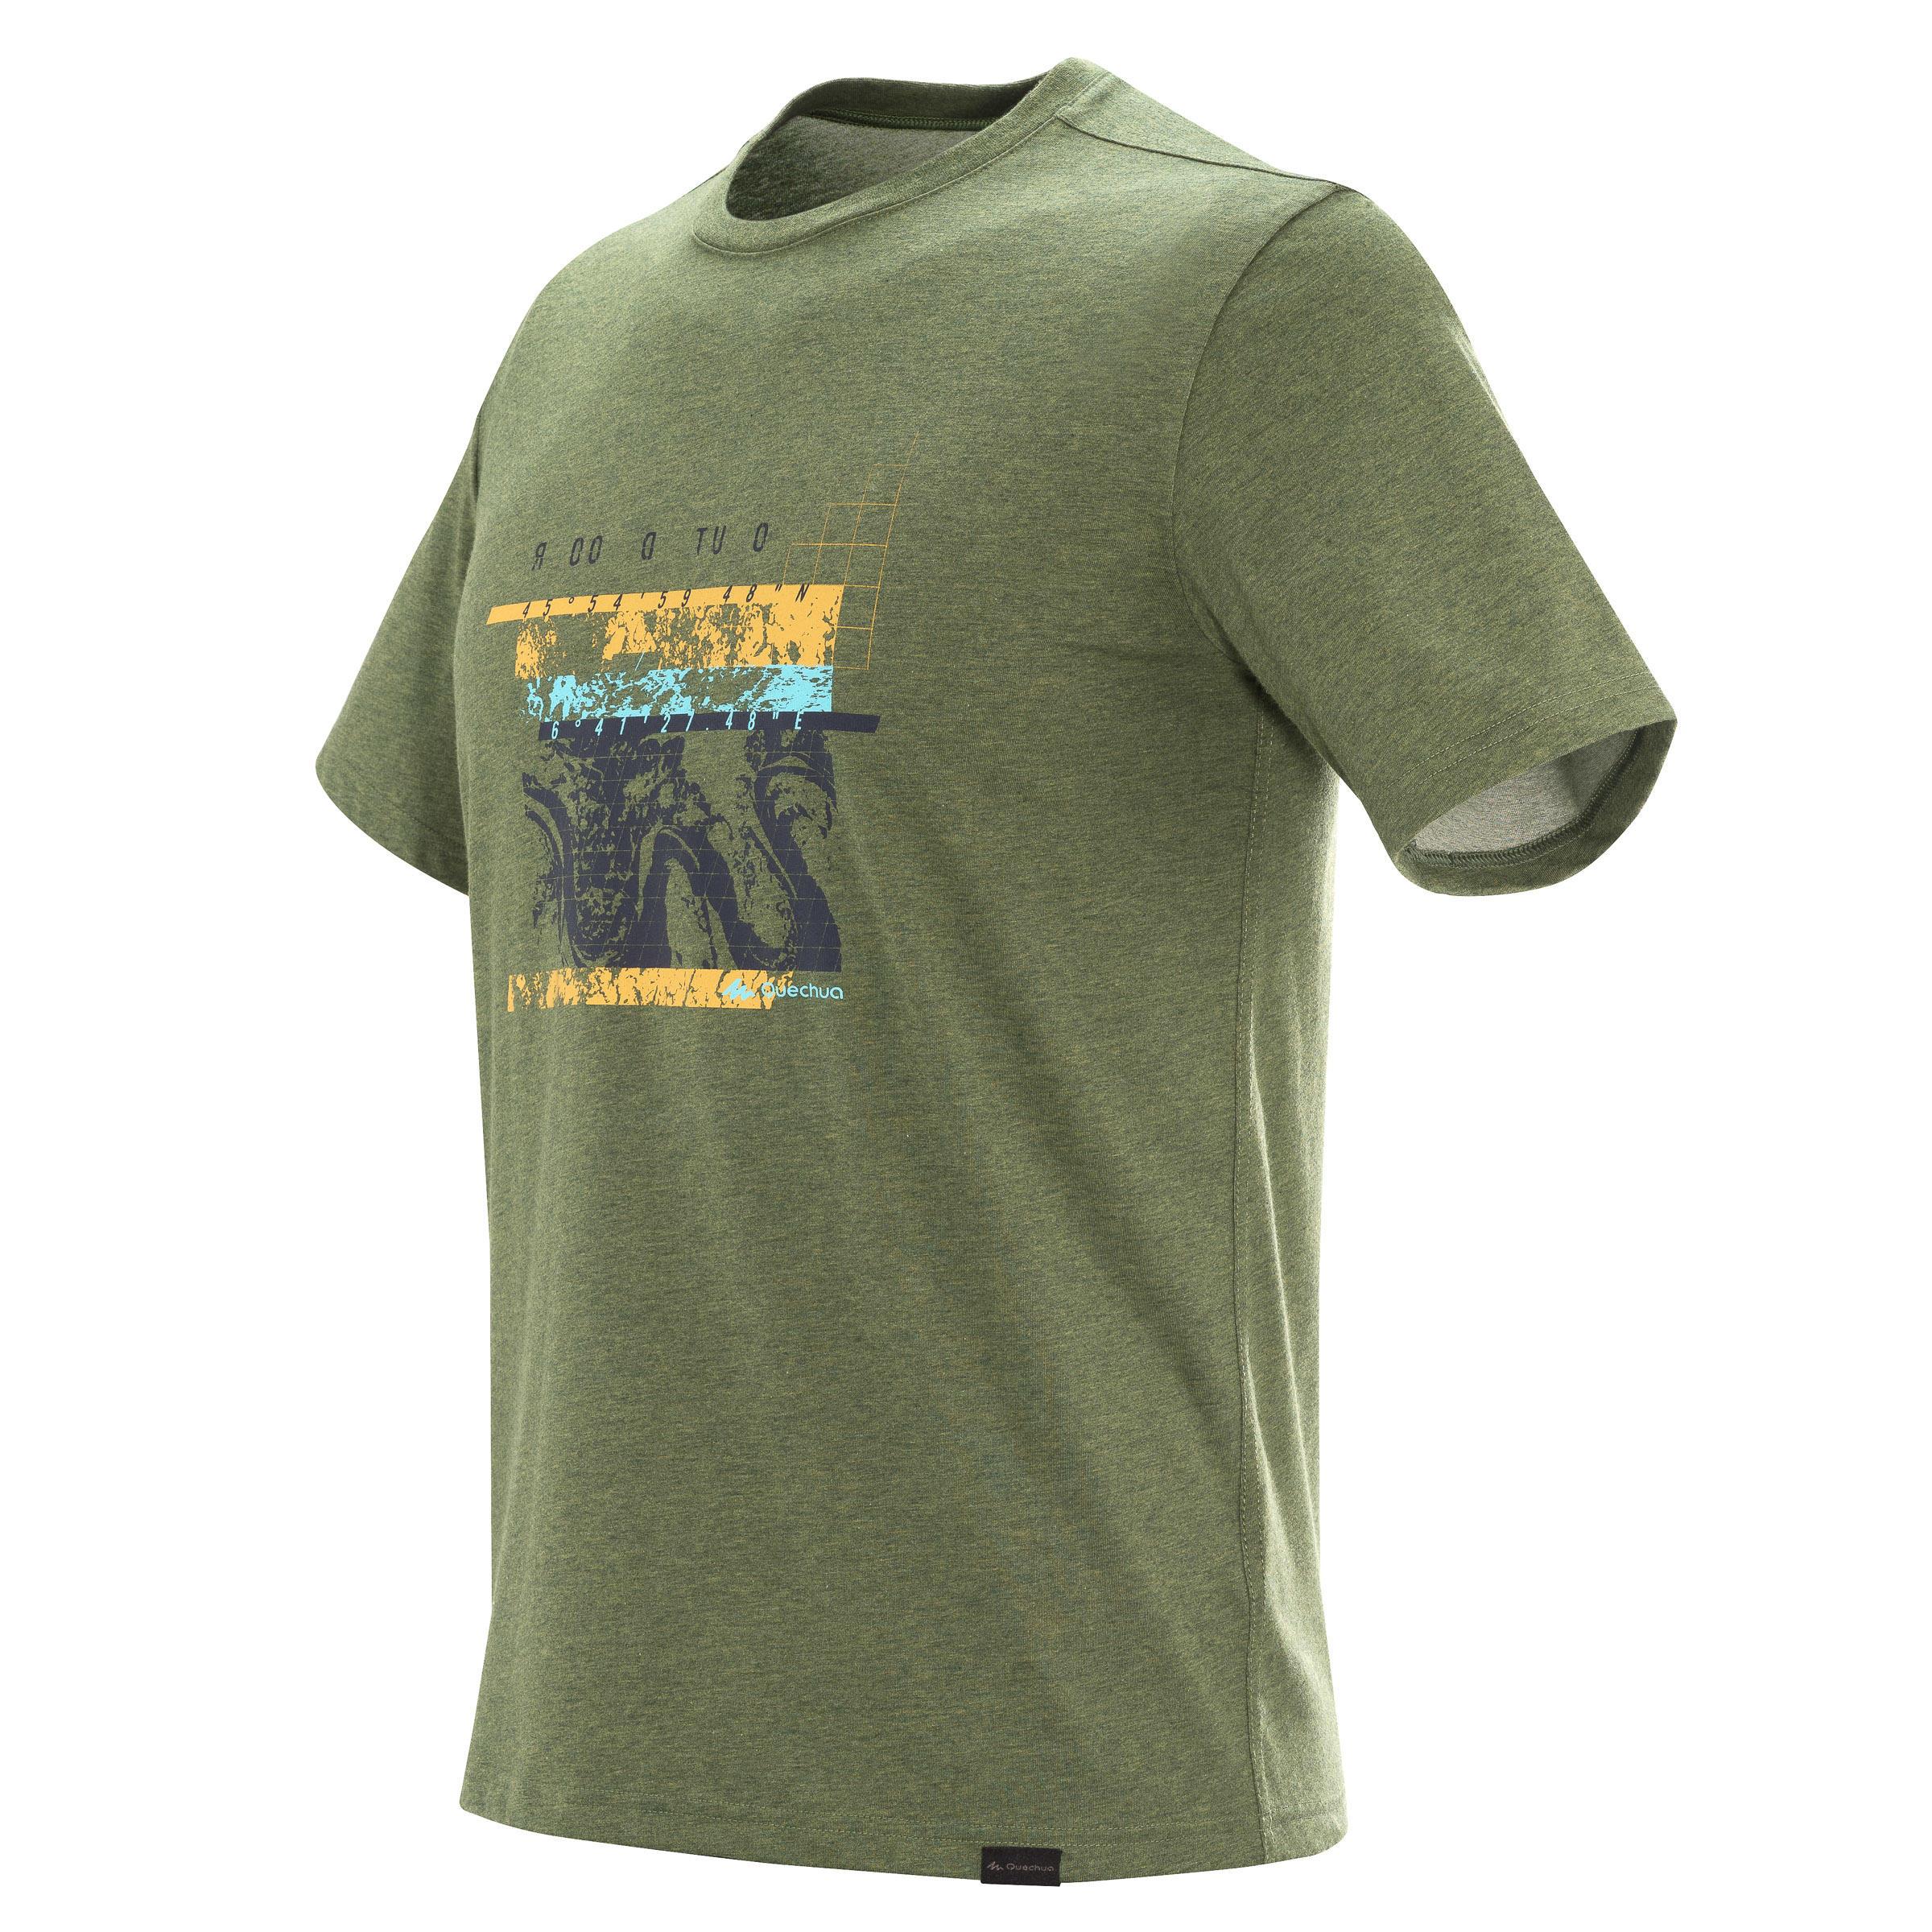 NH500 Men's Country Walking T-shirt - Khaki